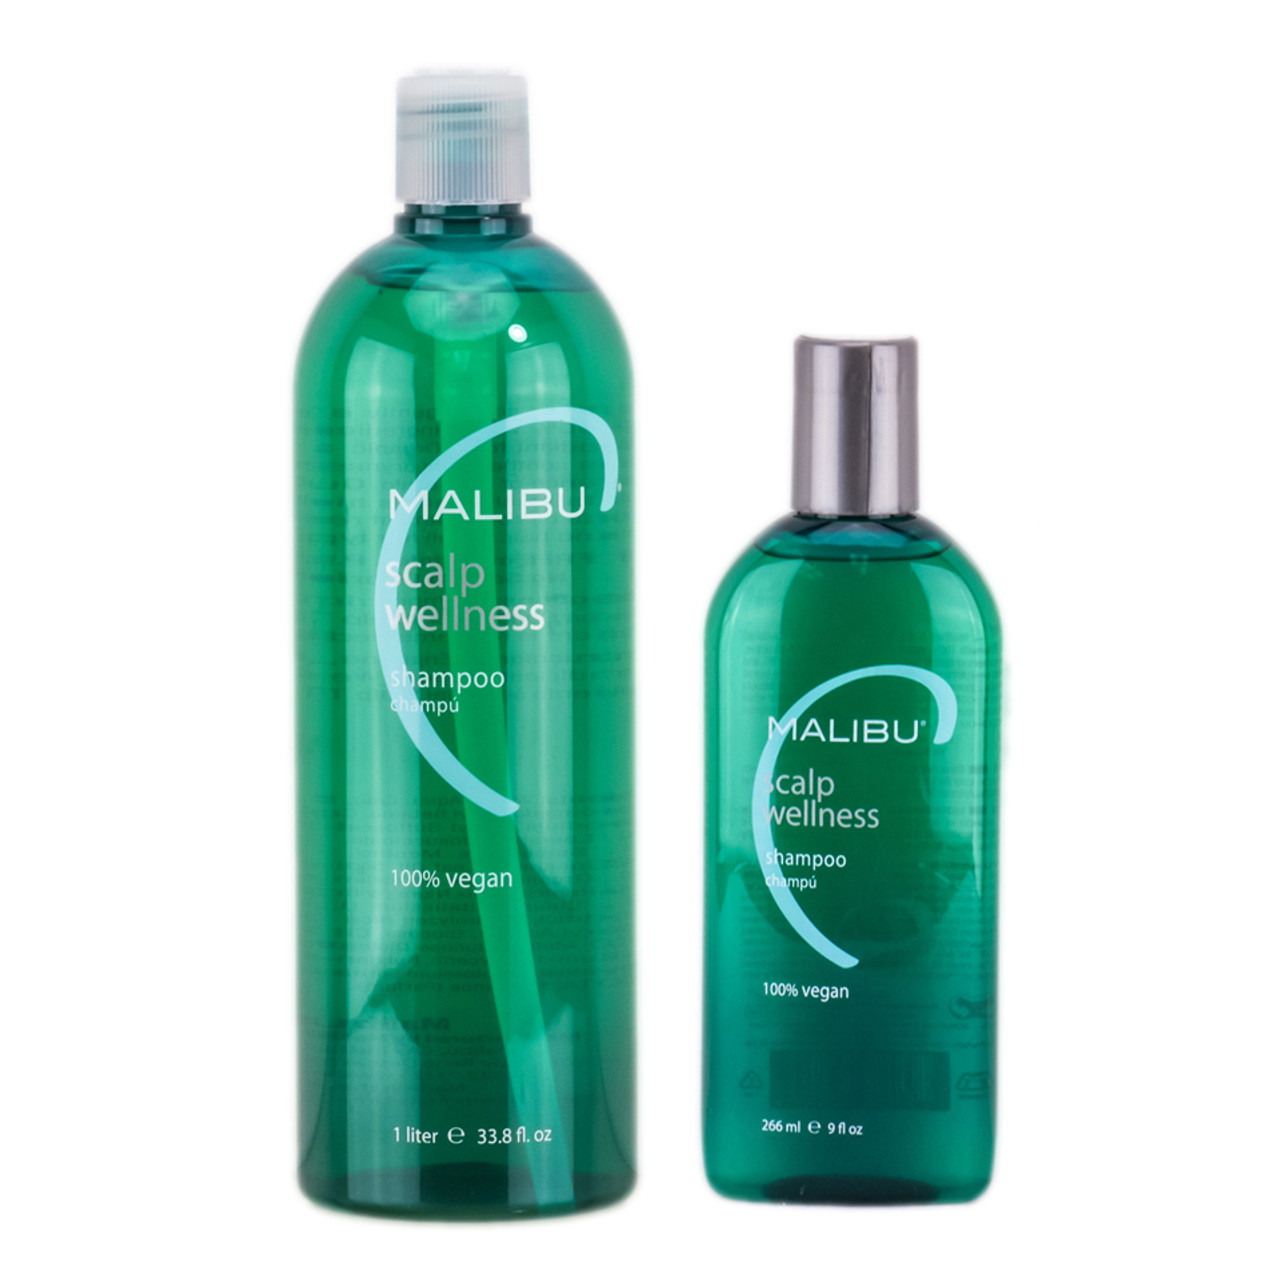 Malibu C Scalp Wellness Shampoo Sleekshop Com Formerly